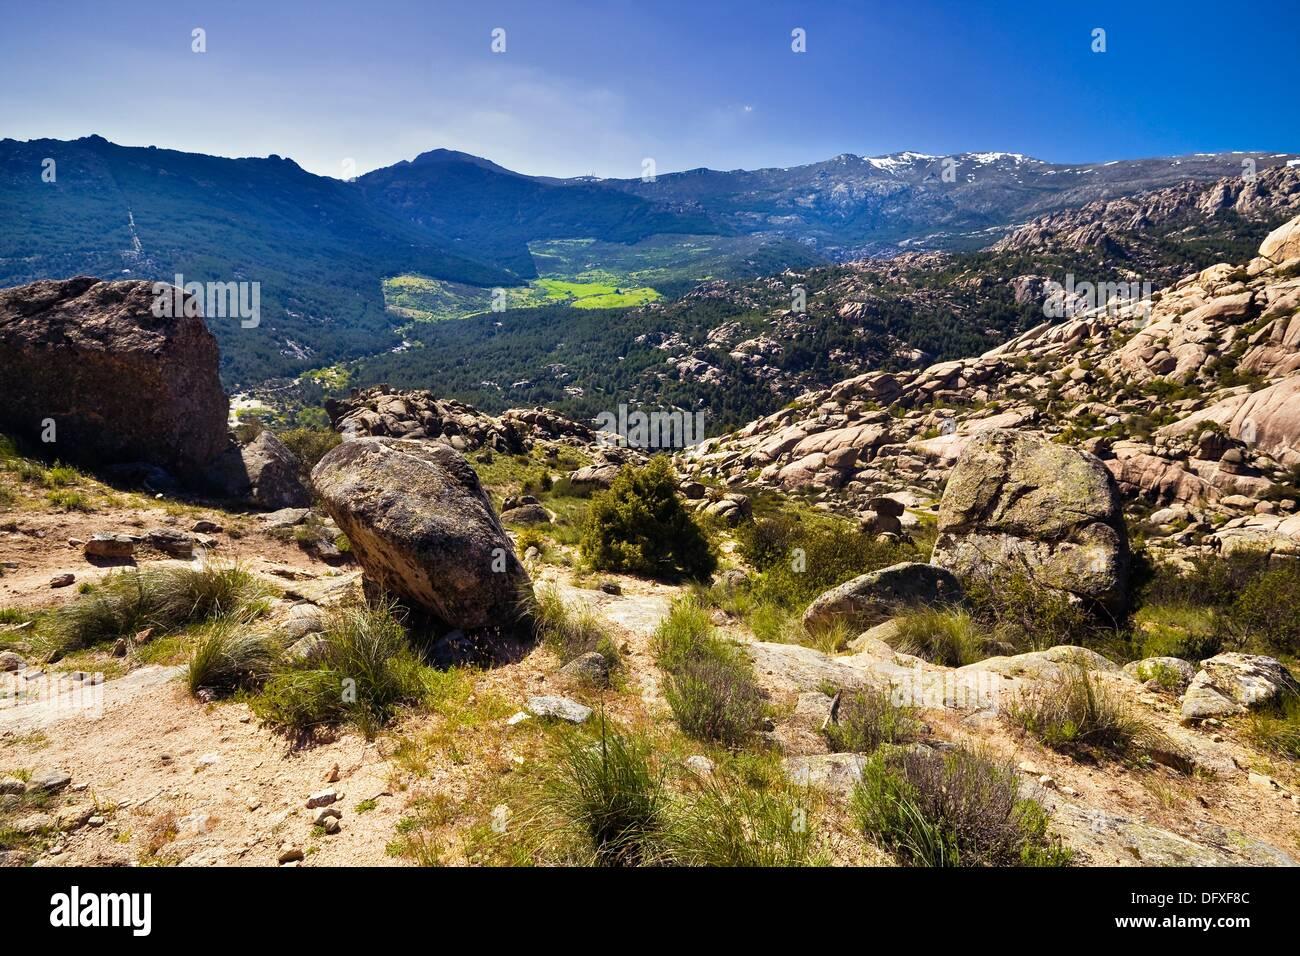 Sierra de Guadarrama Spain  city photos : Sierra De Guadarrama From La Pedriza Regional Park Cuenca Alta Del ...